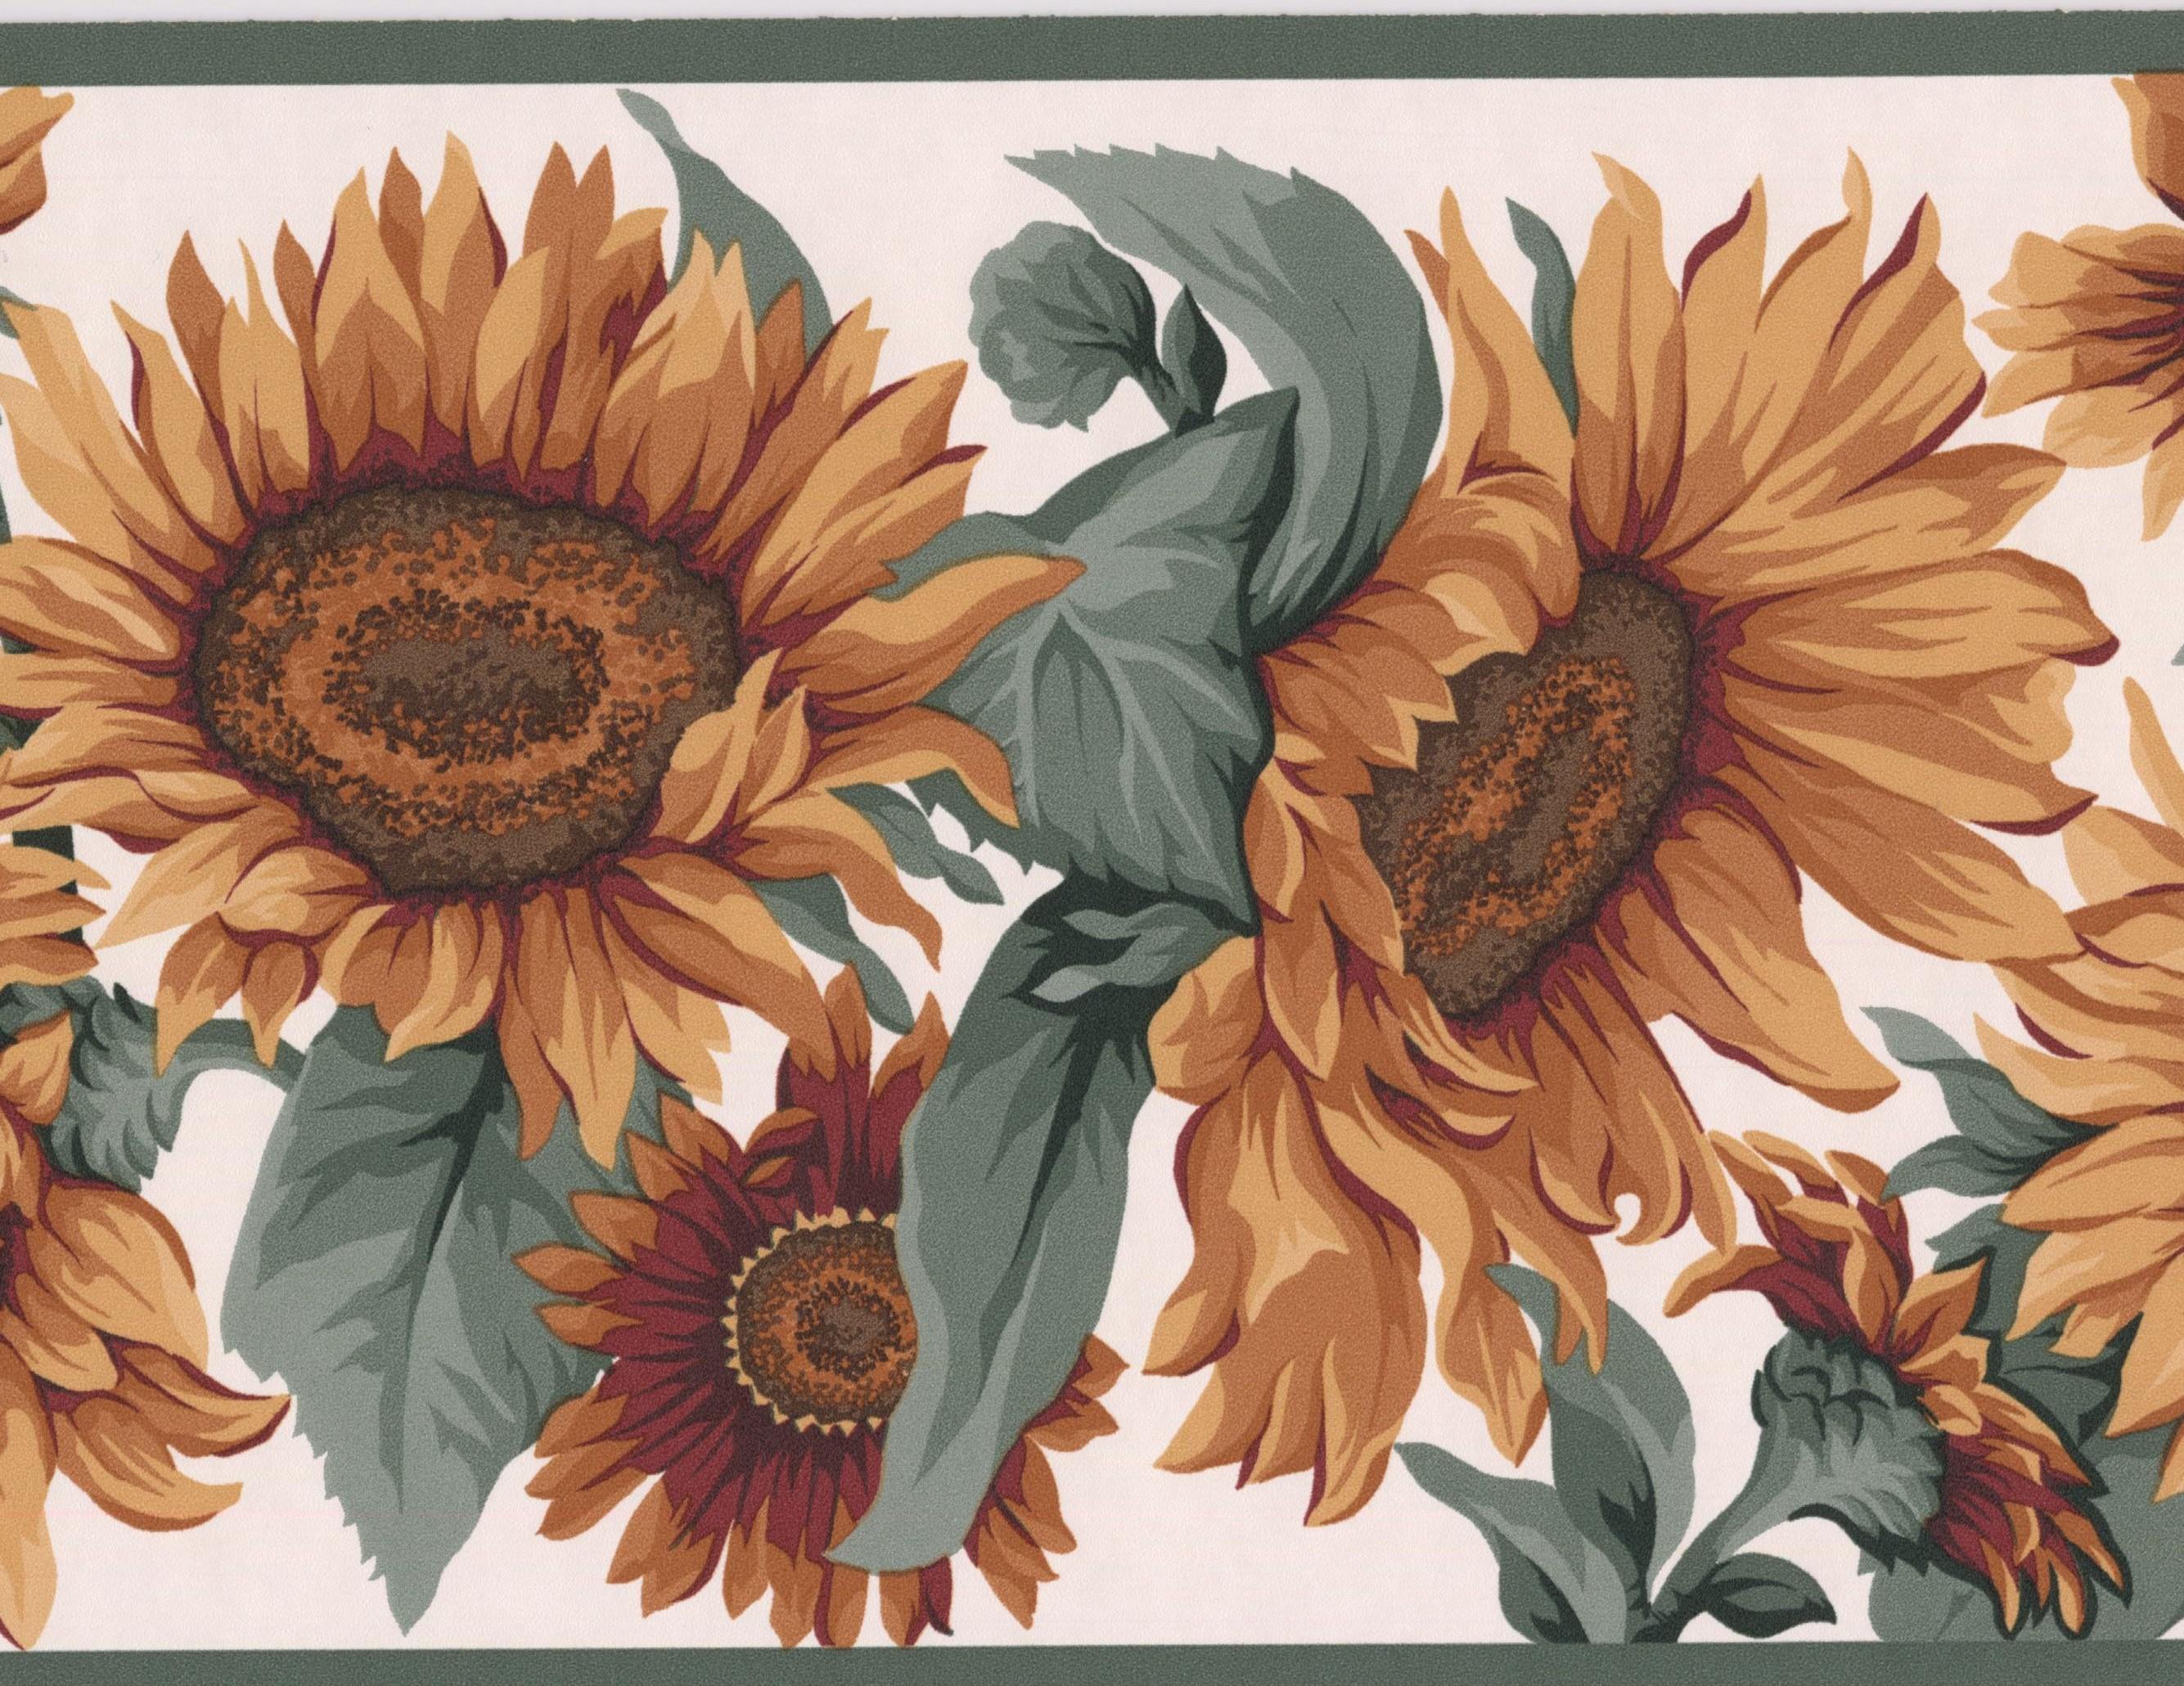 Sunflower Laptop Wallpaper Aesthetic 2669x2061 Wallpaper Teahub Io